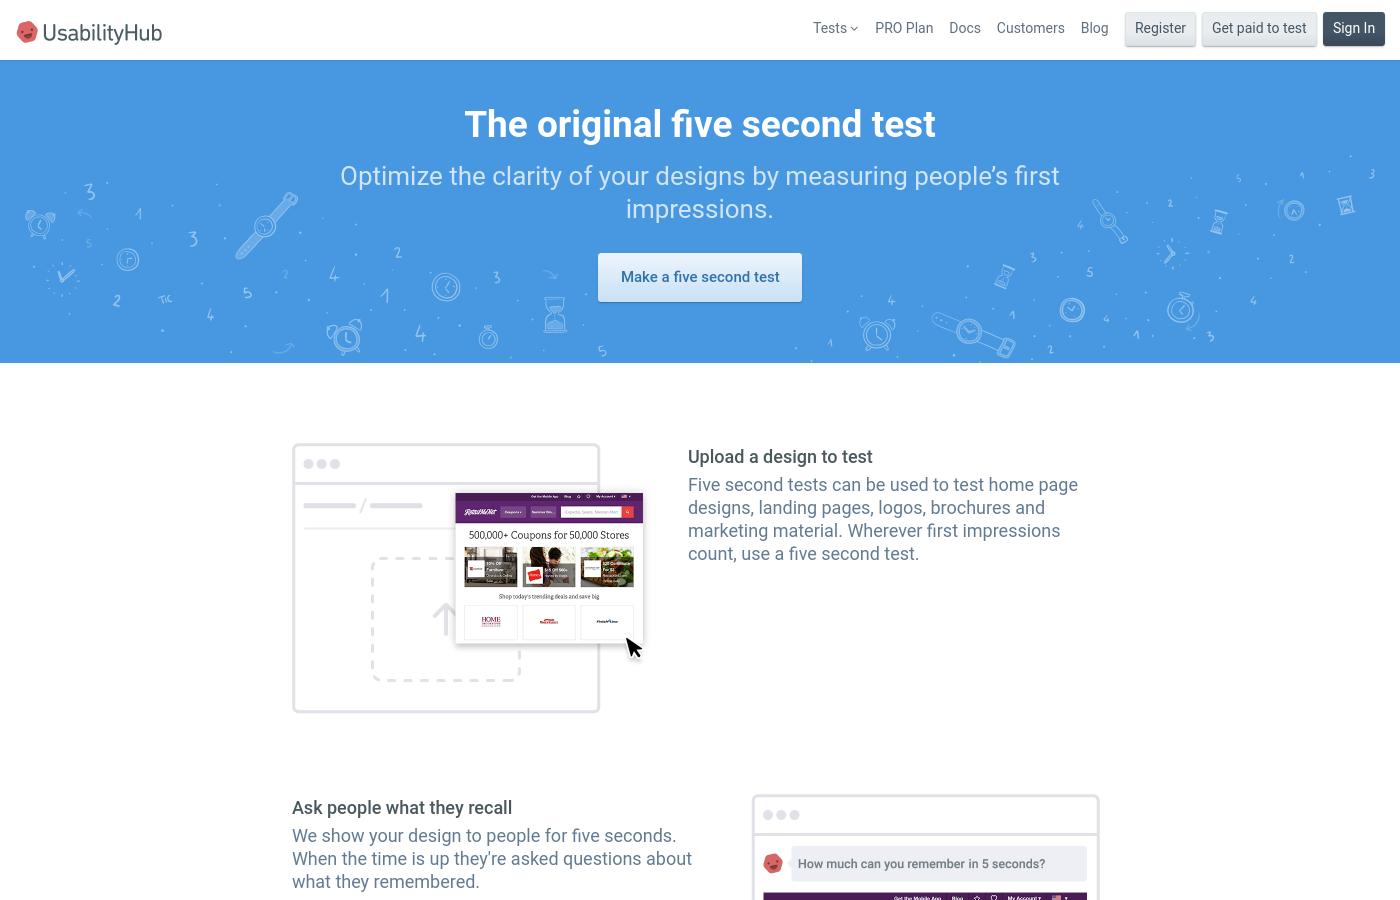 5 Seconds Test